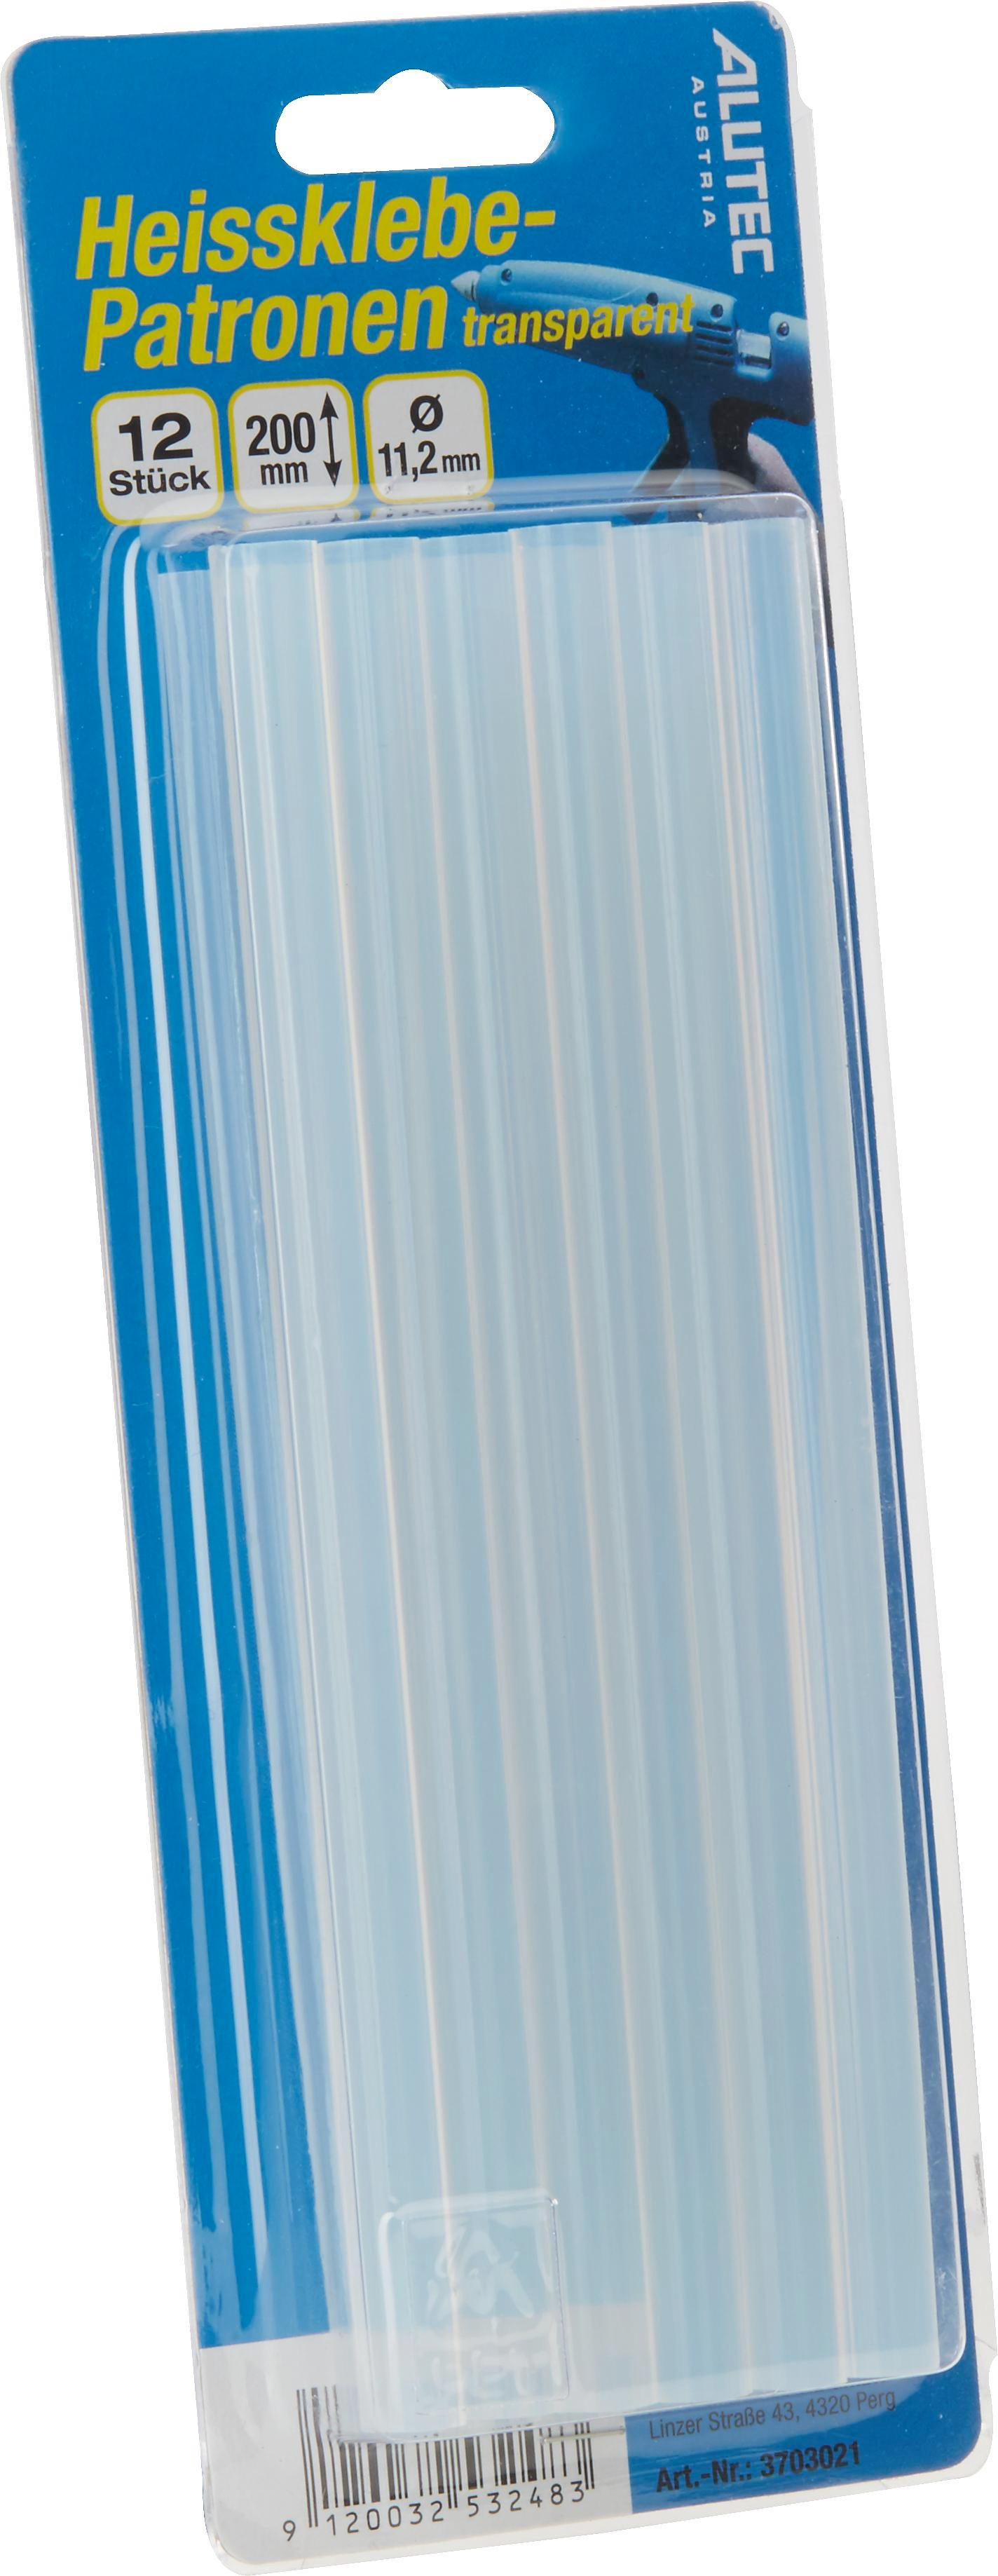 Heißklebepatronen Theodor in Transparent - Transparent (0,0416kg)